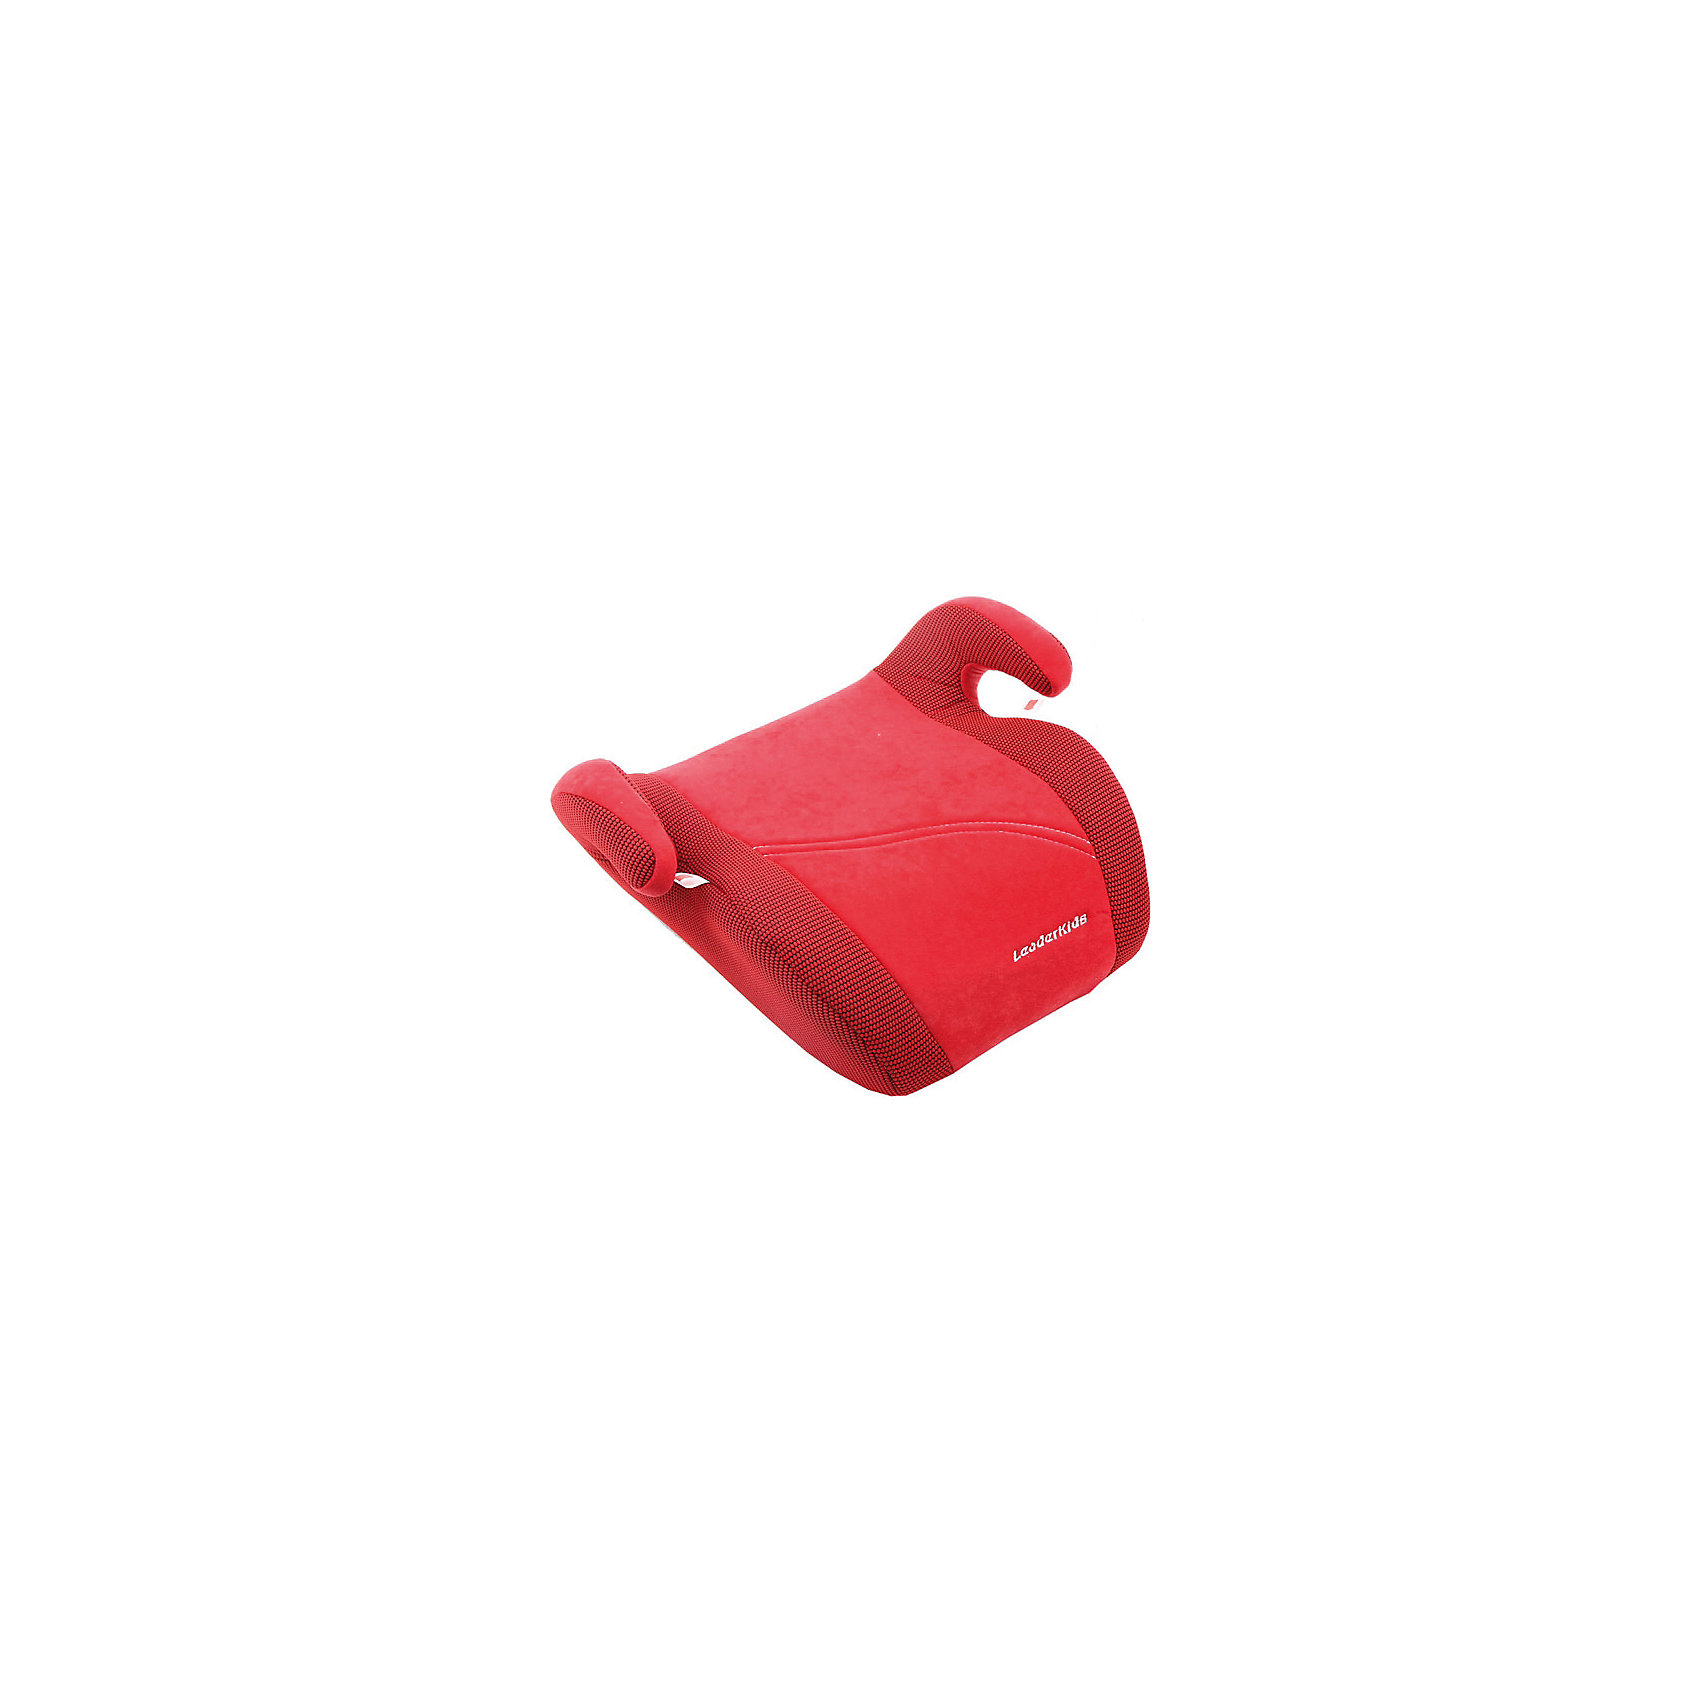 Автокресло-бустер 22-36 кг., Leader Kids, красный велюр (Leader kids)